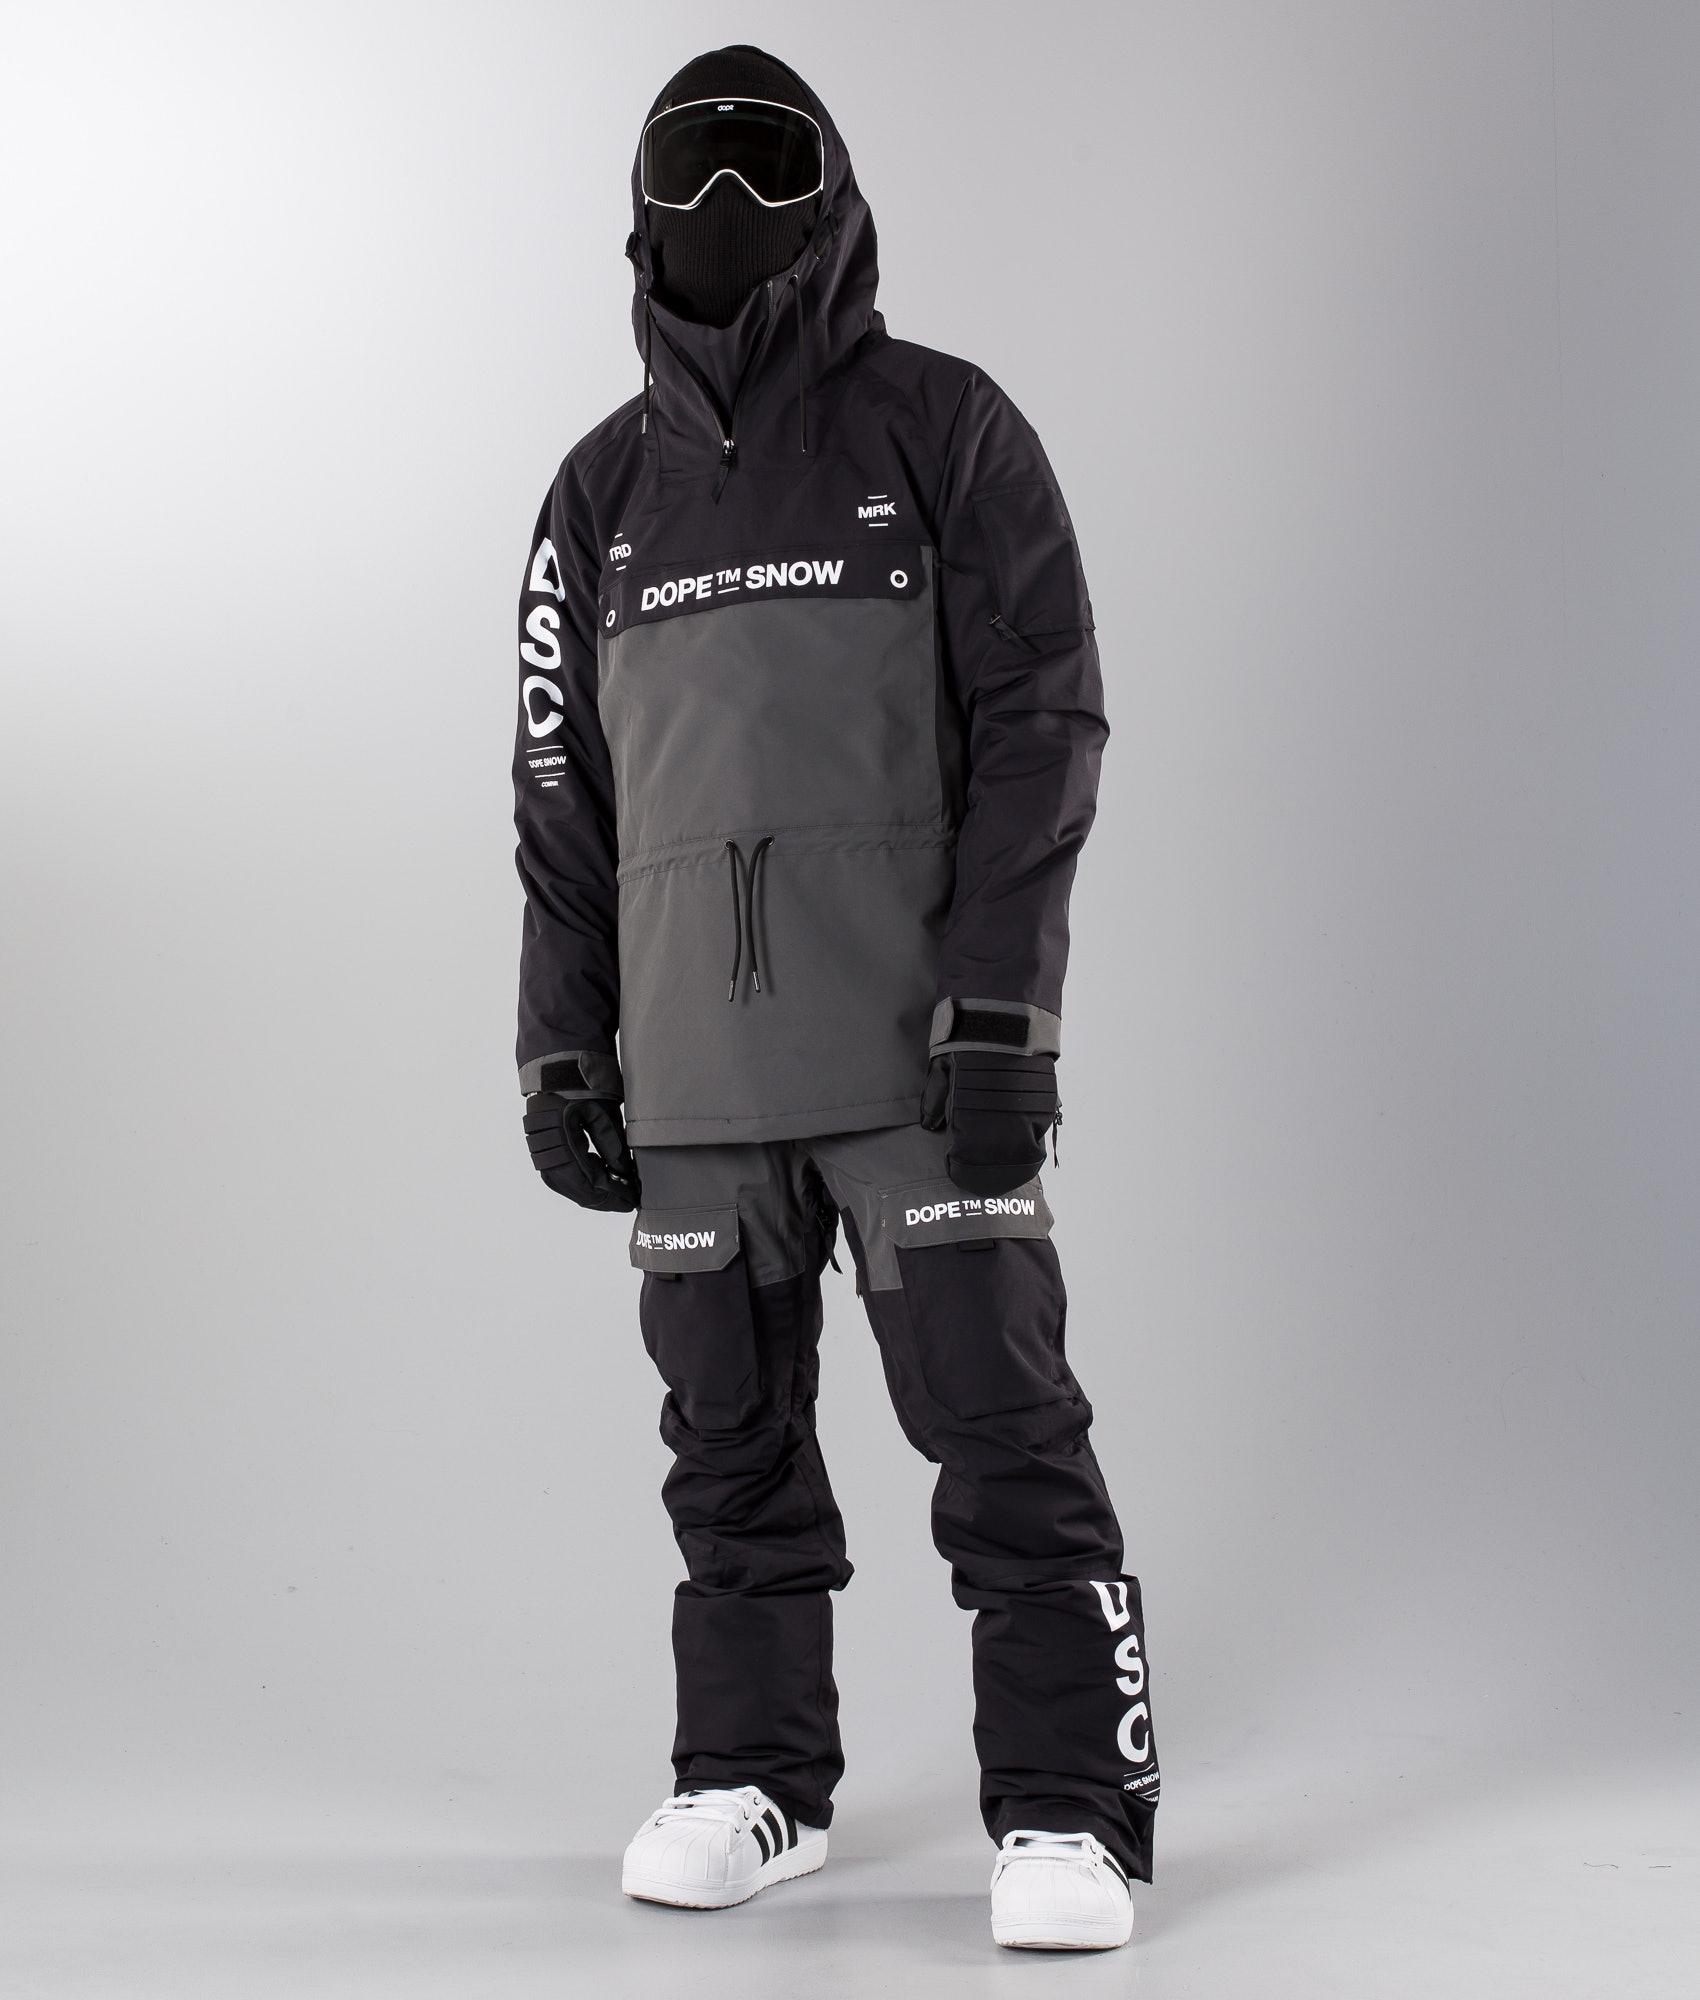 352ce6aa33f Dope Annok DSC Snowboard Jacket Black Dark Grey II - Ridestore.com